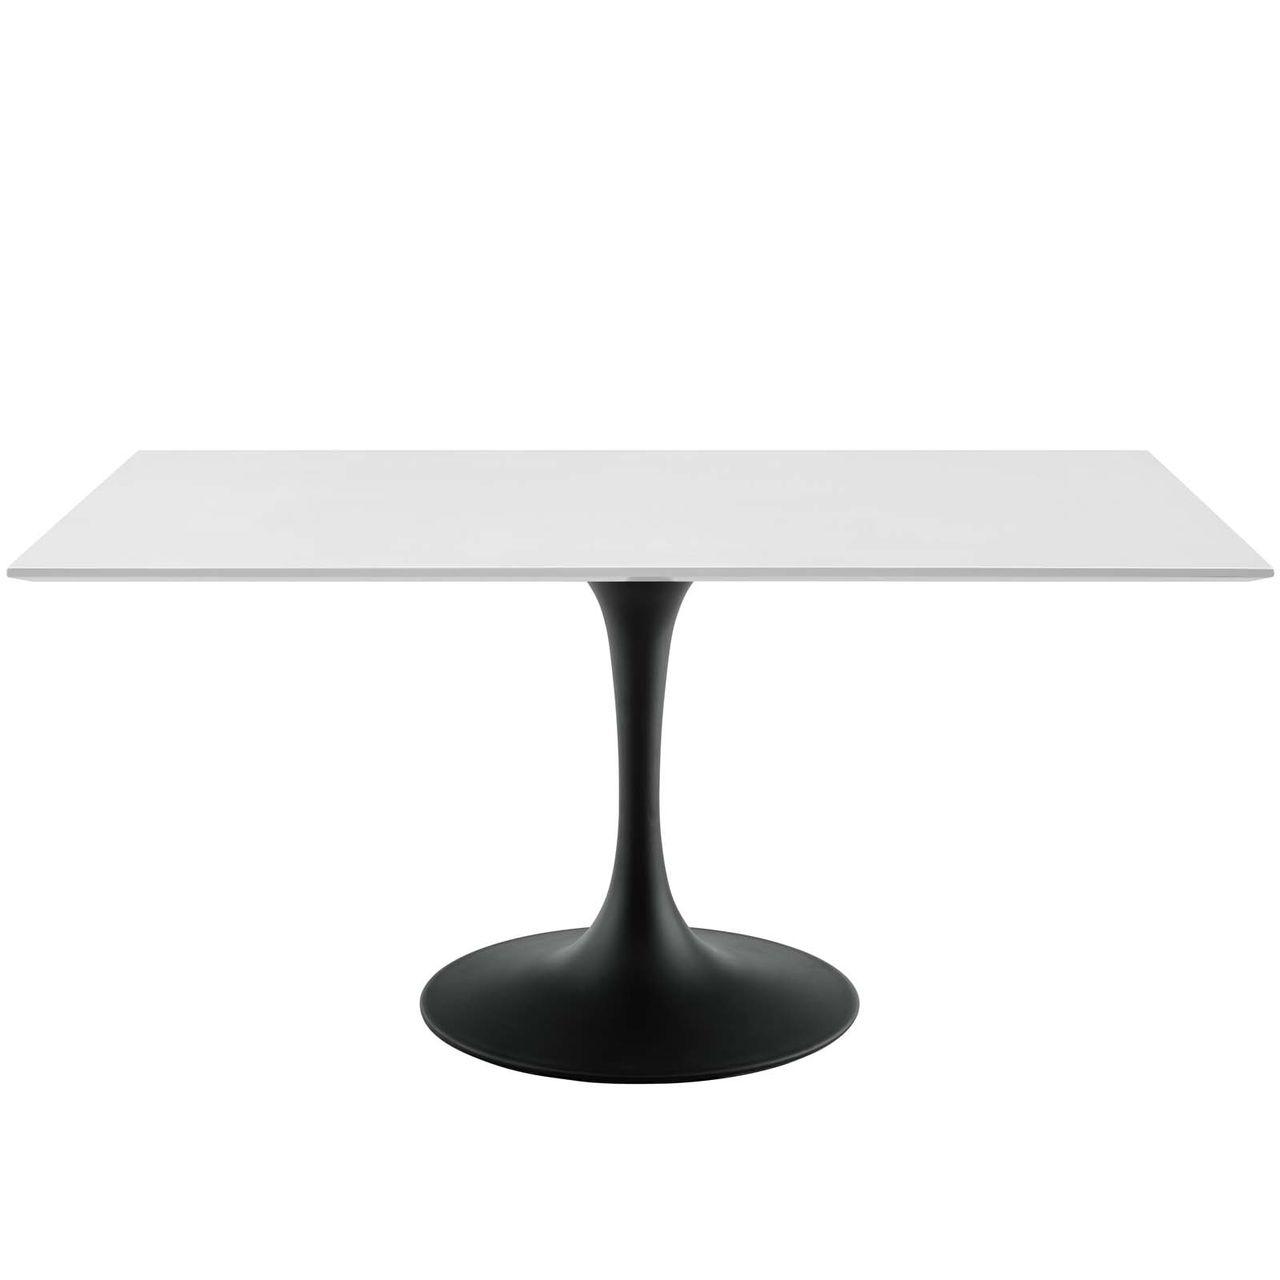 "Modway Lippa 60"" Rectangle Wood Dining Table - Black White"